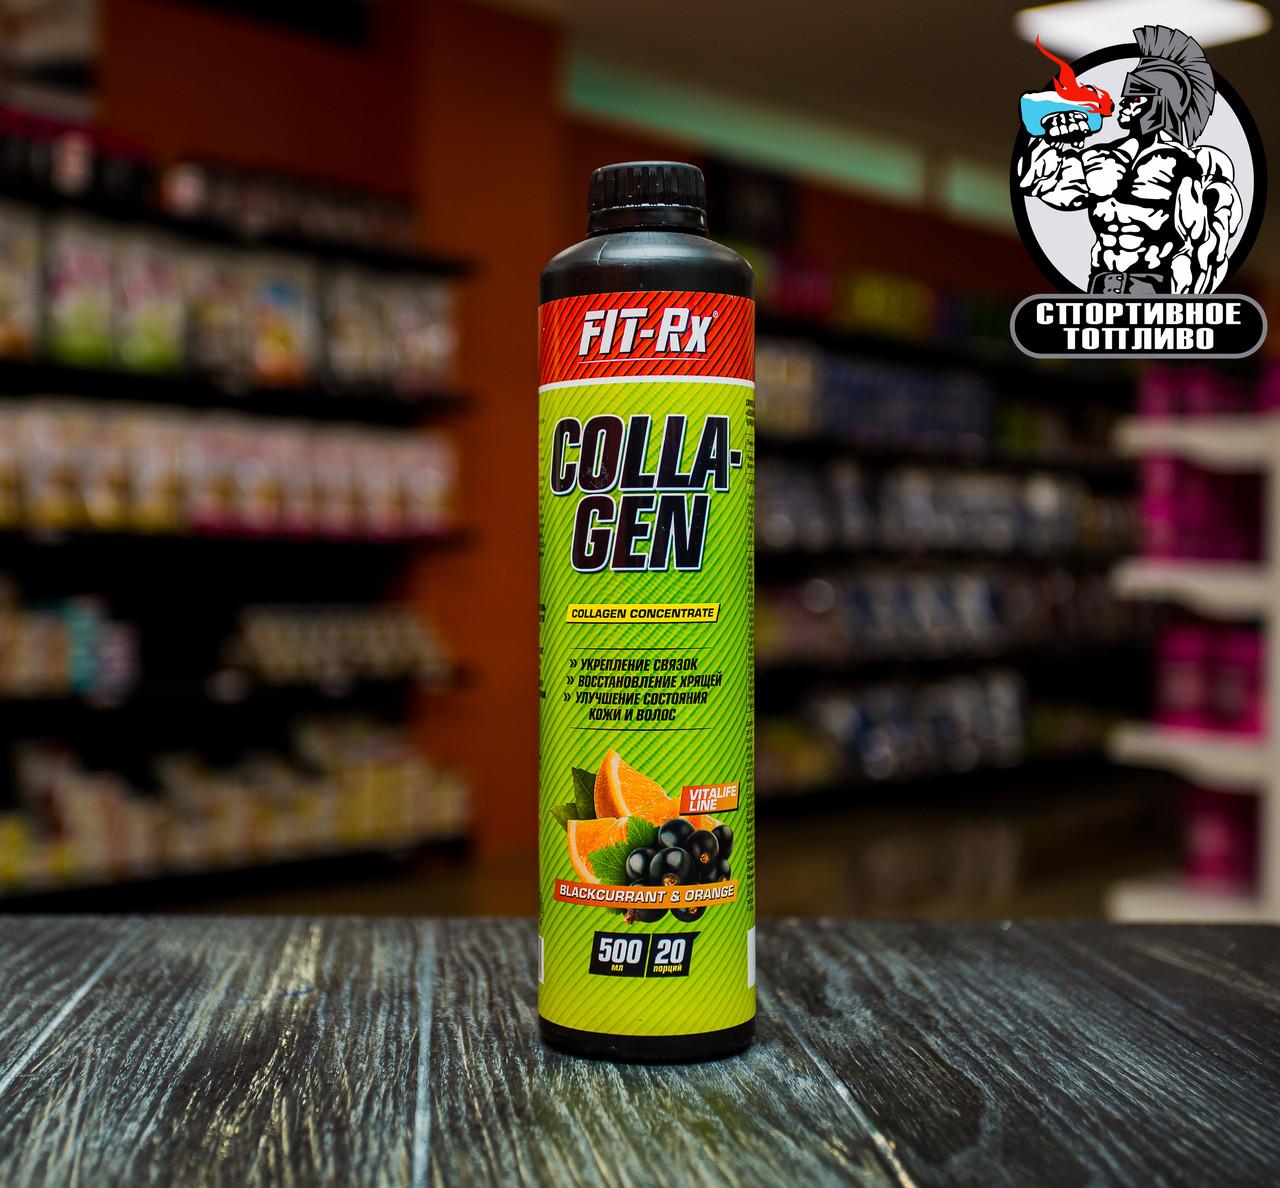 "Коллаген от Fit-Rx ""Collagen"" 500мл/20порций"